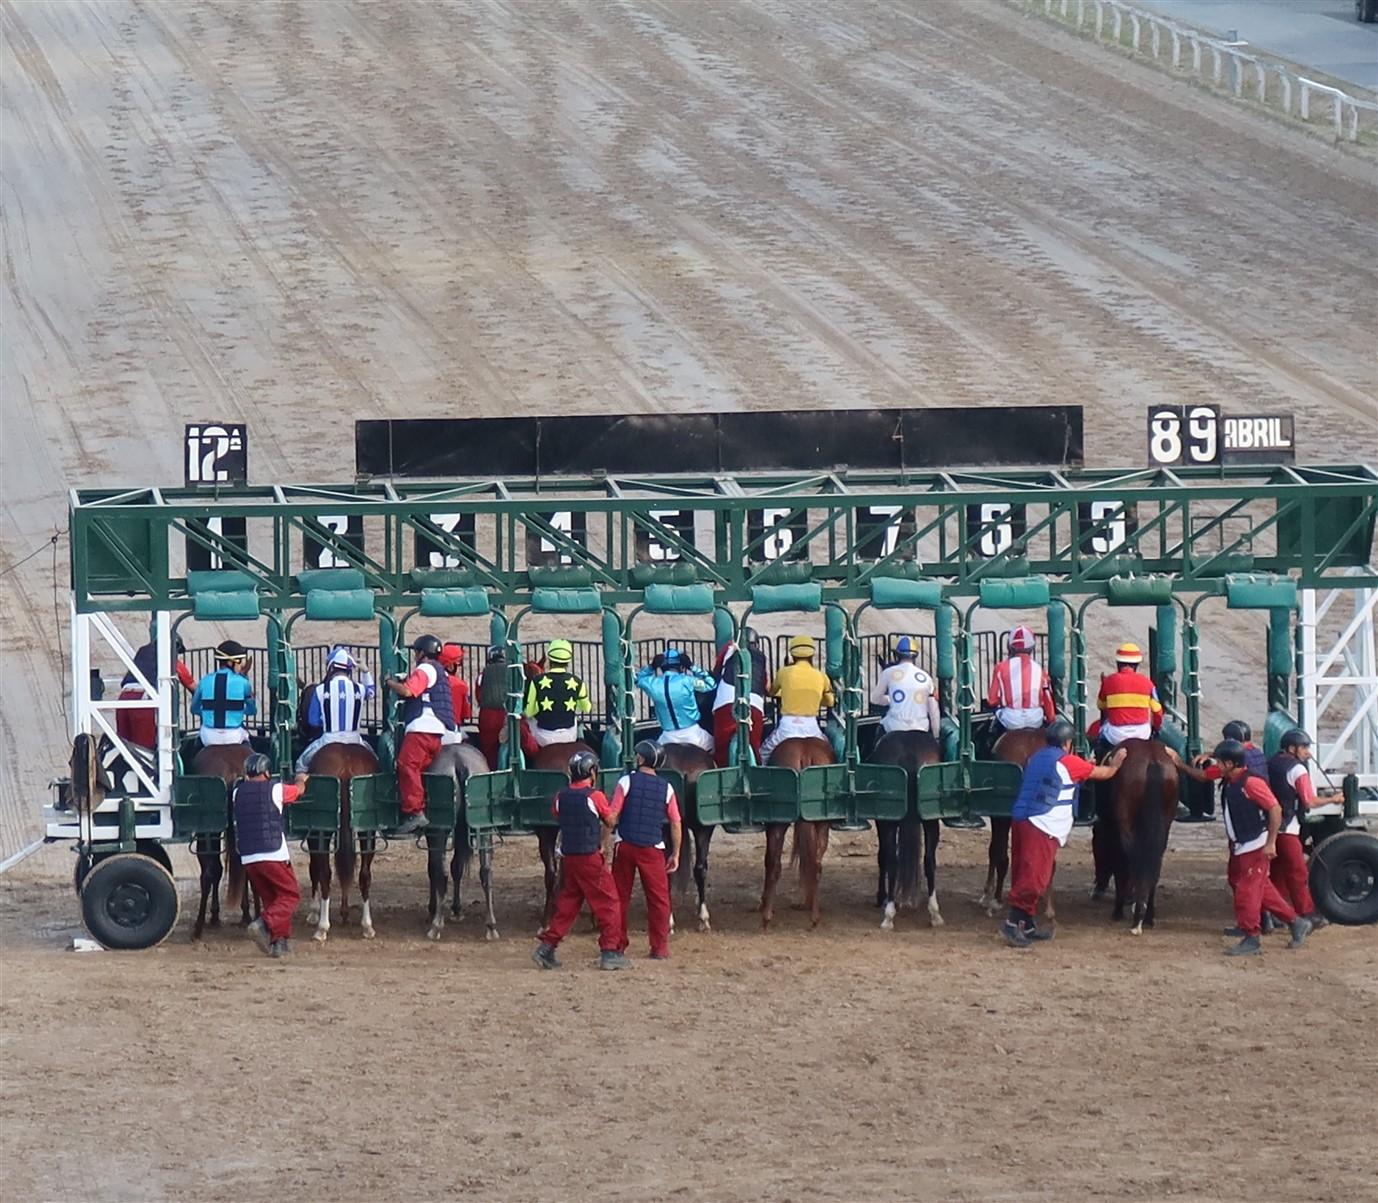 2020 03 07 335 Buenos Aires Hippodromo Palermo.jpg